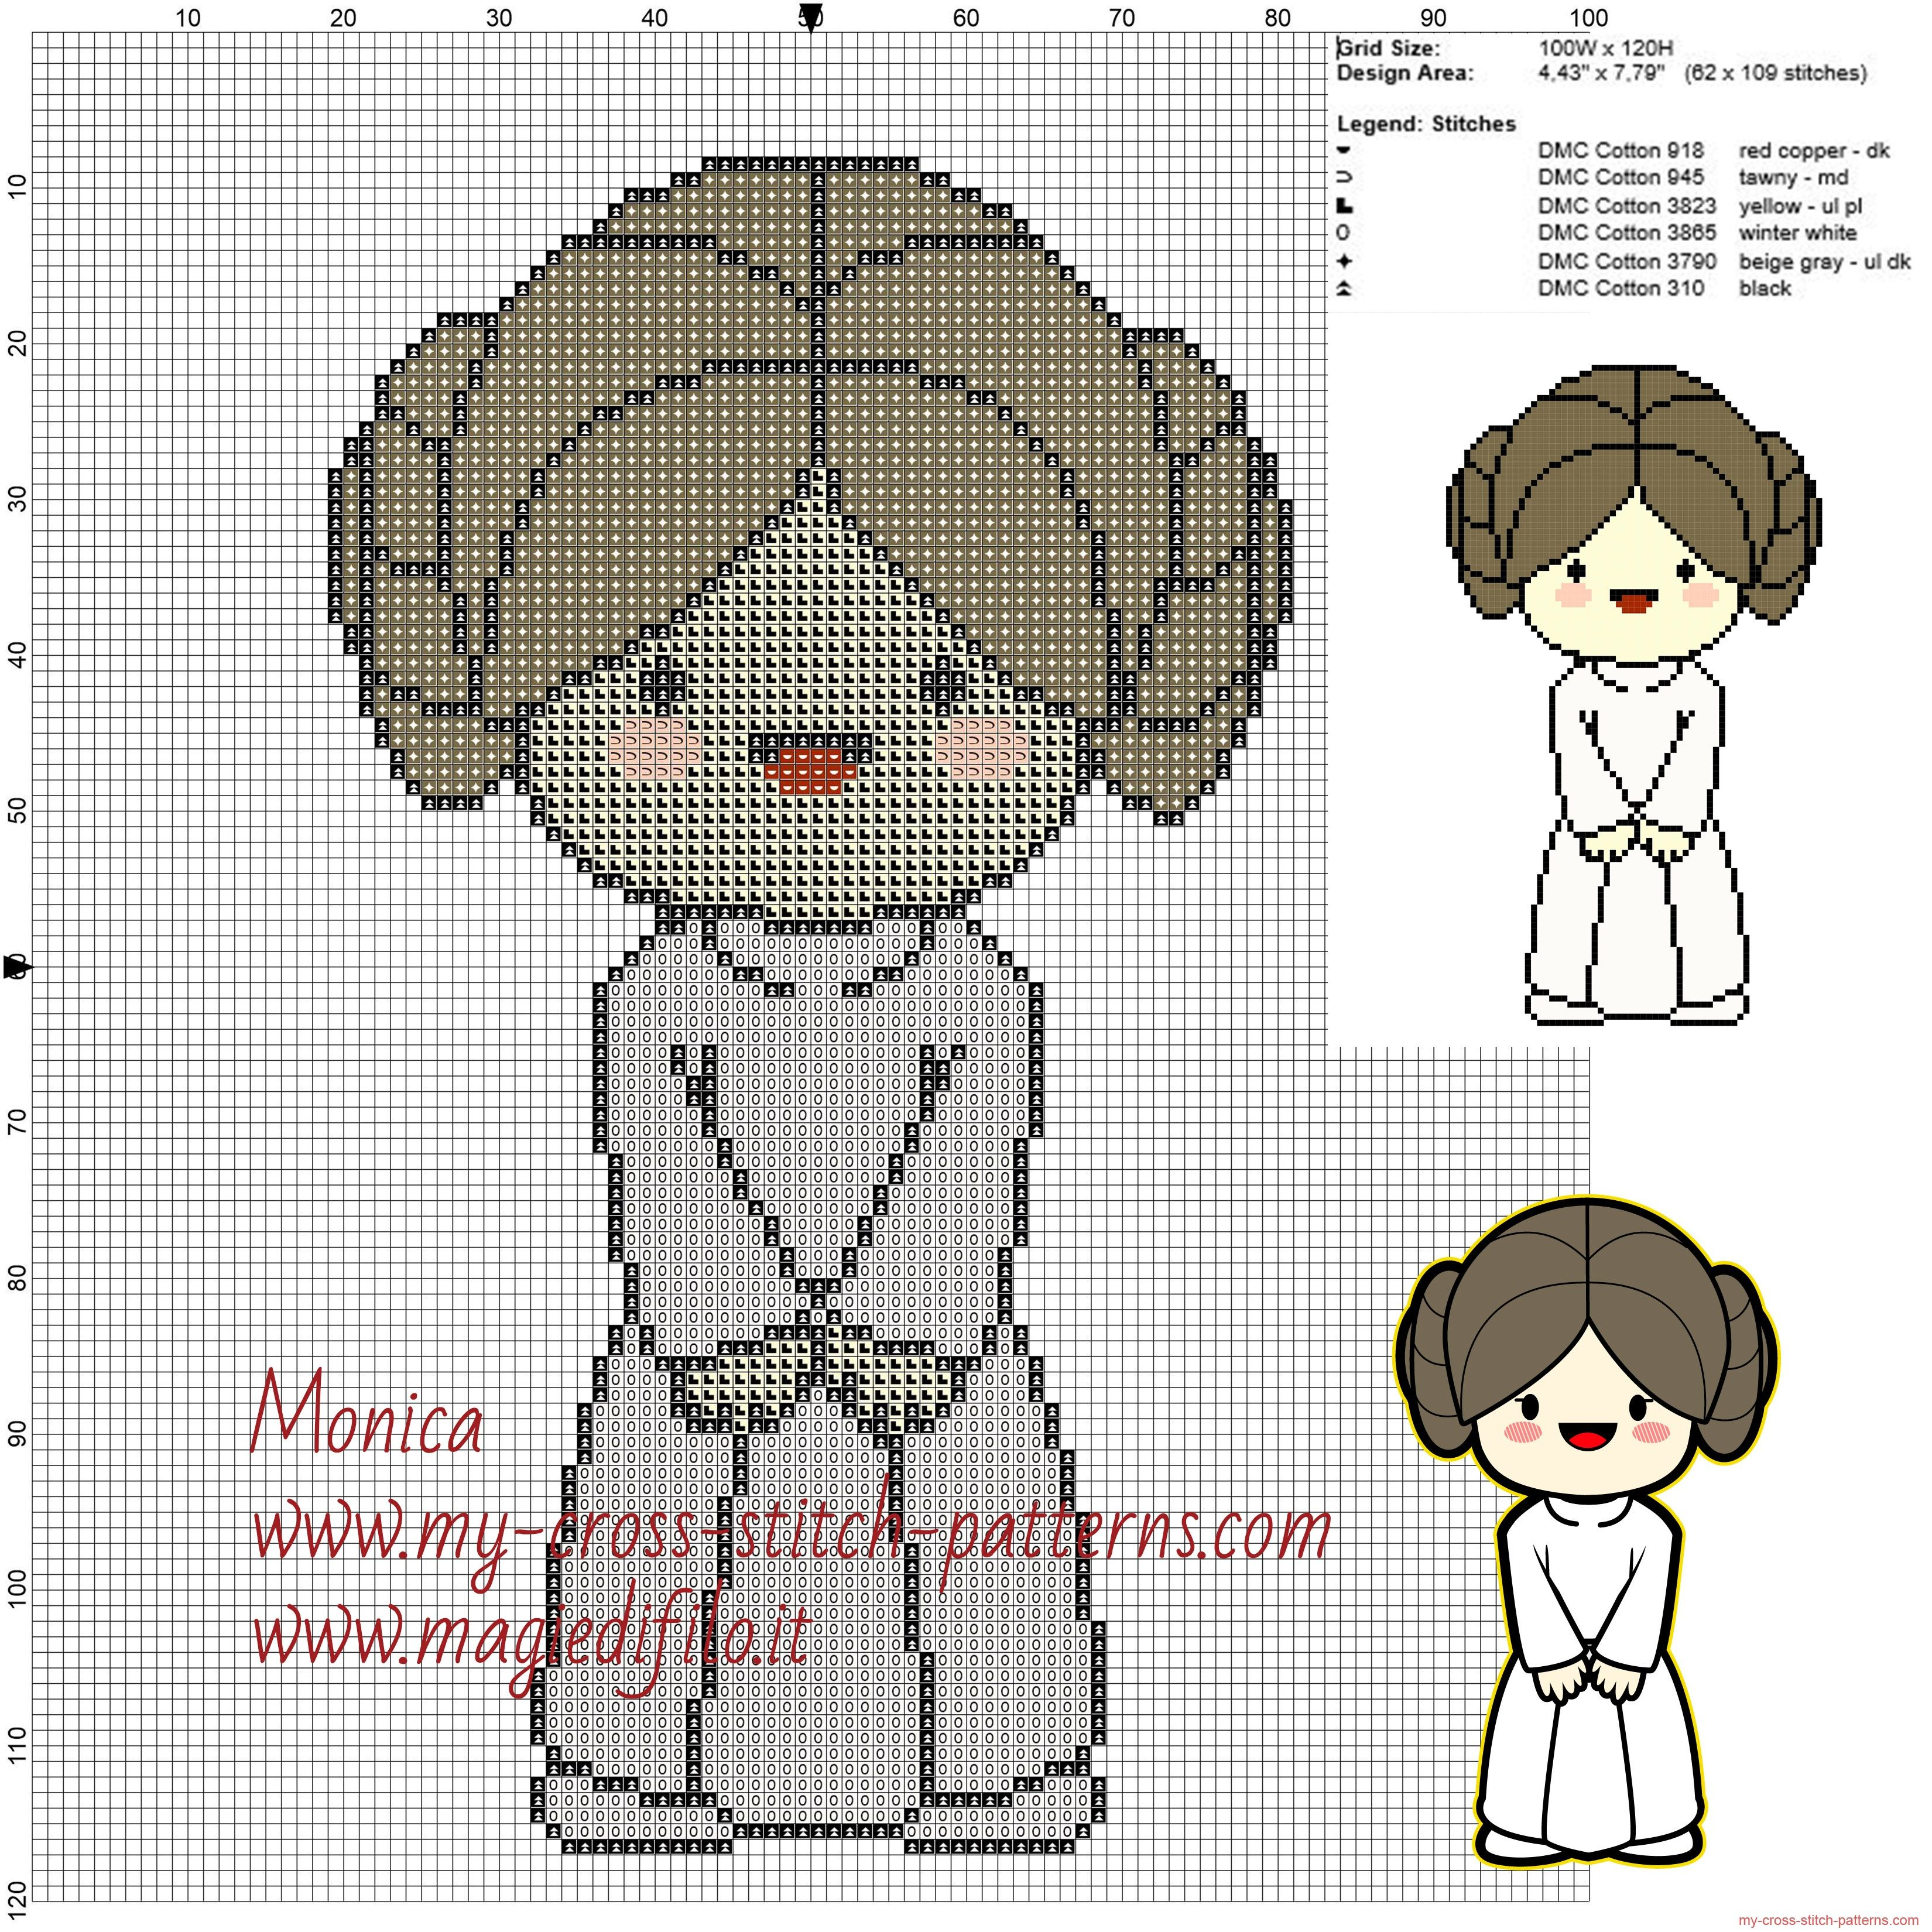 Princess Leia (Star Wars) cross stitch pattern | Elişi | Cross ...